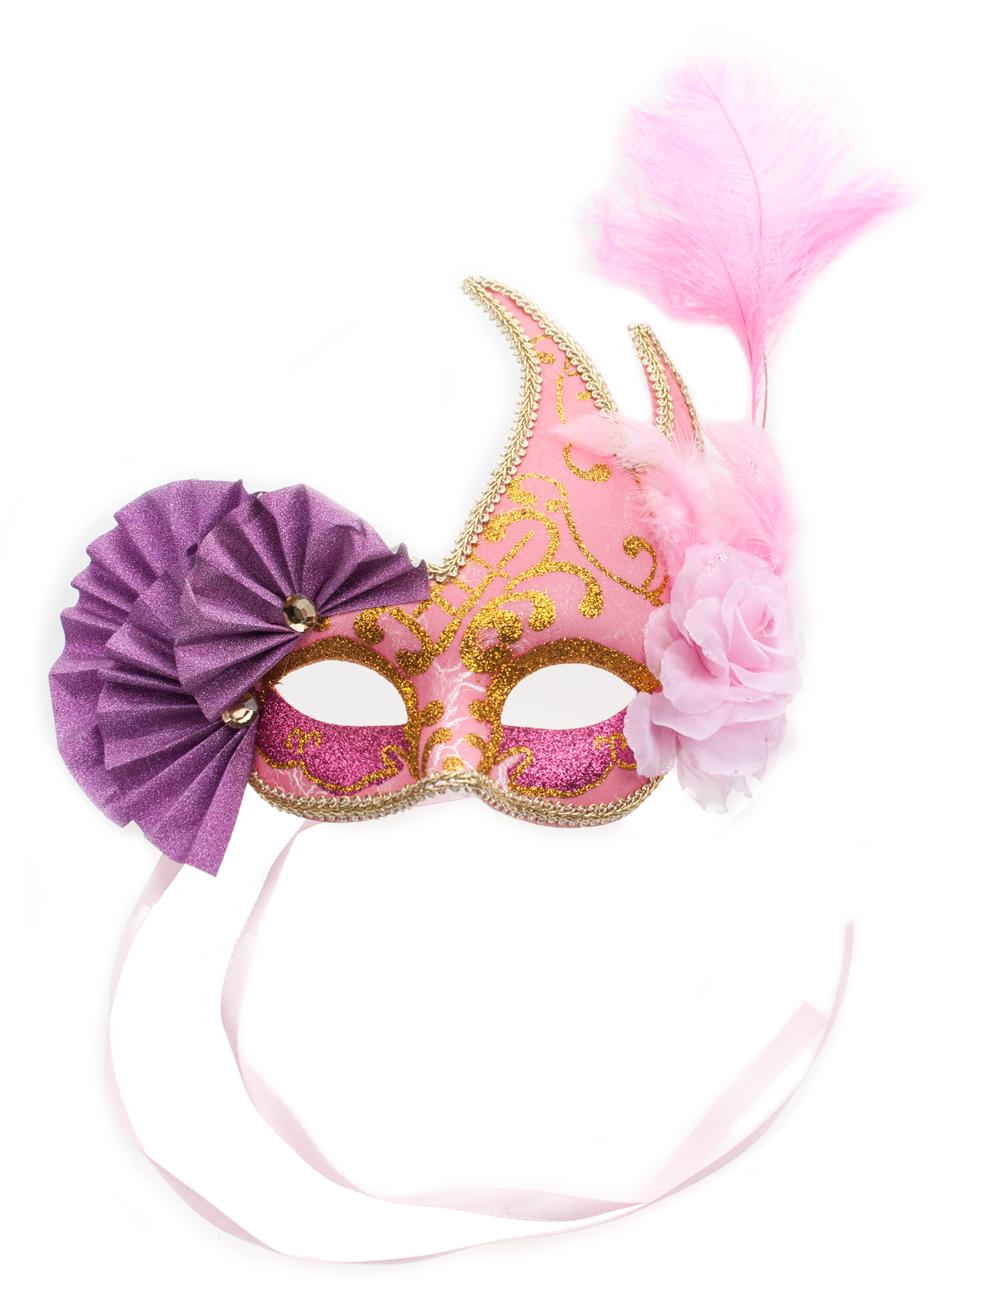 Kostuemzubehor Federmaske Venezia pink/lila